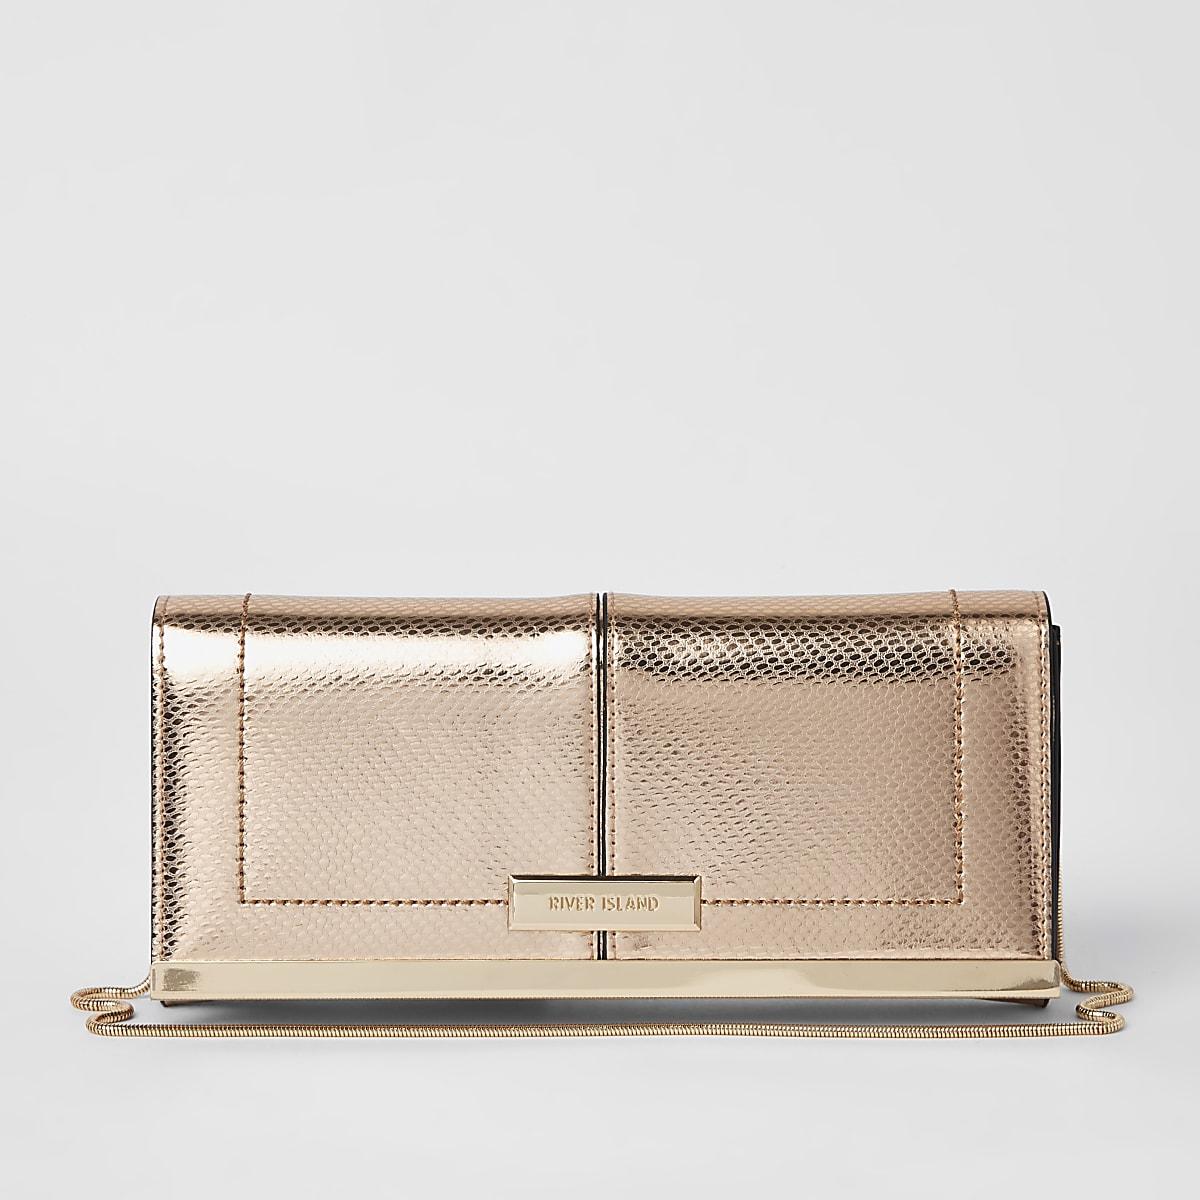 90c48b3b77 Rose gold baguette clutch bag - Clutch Bags - Bags & Purses - women